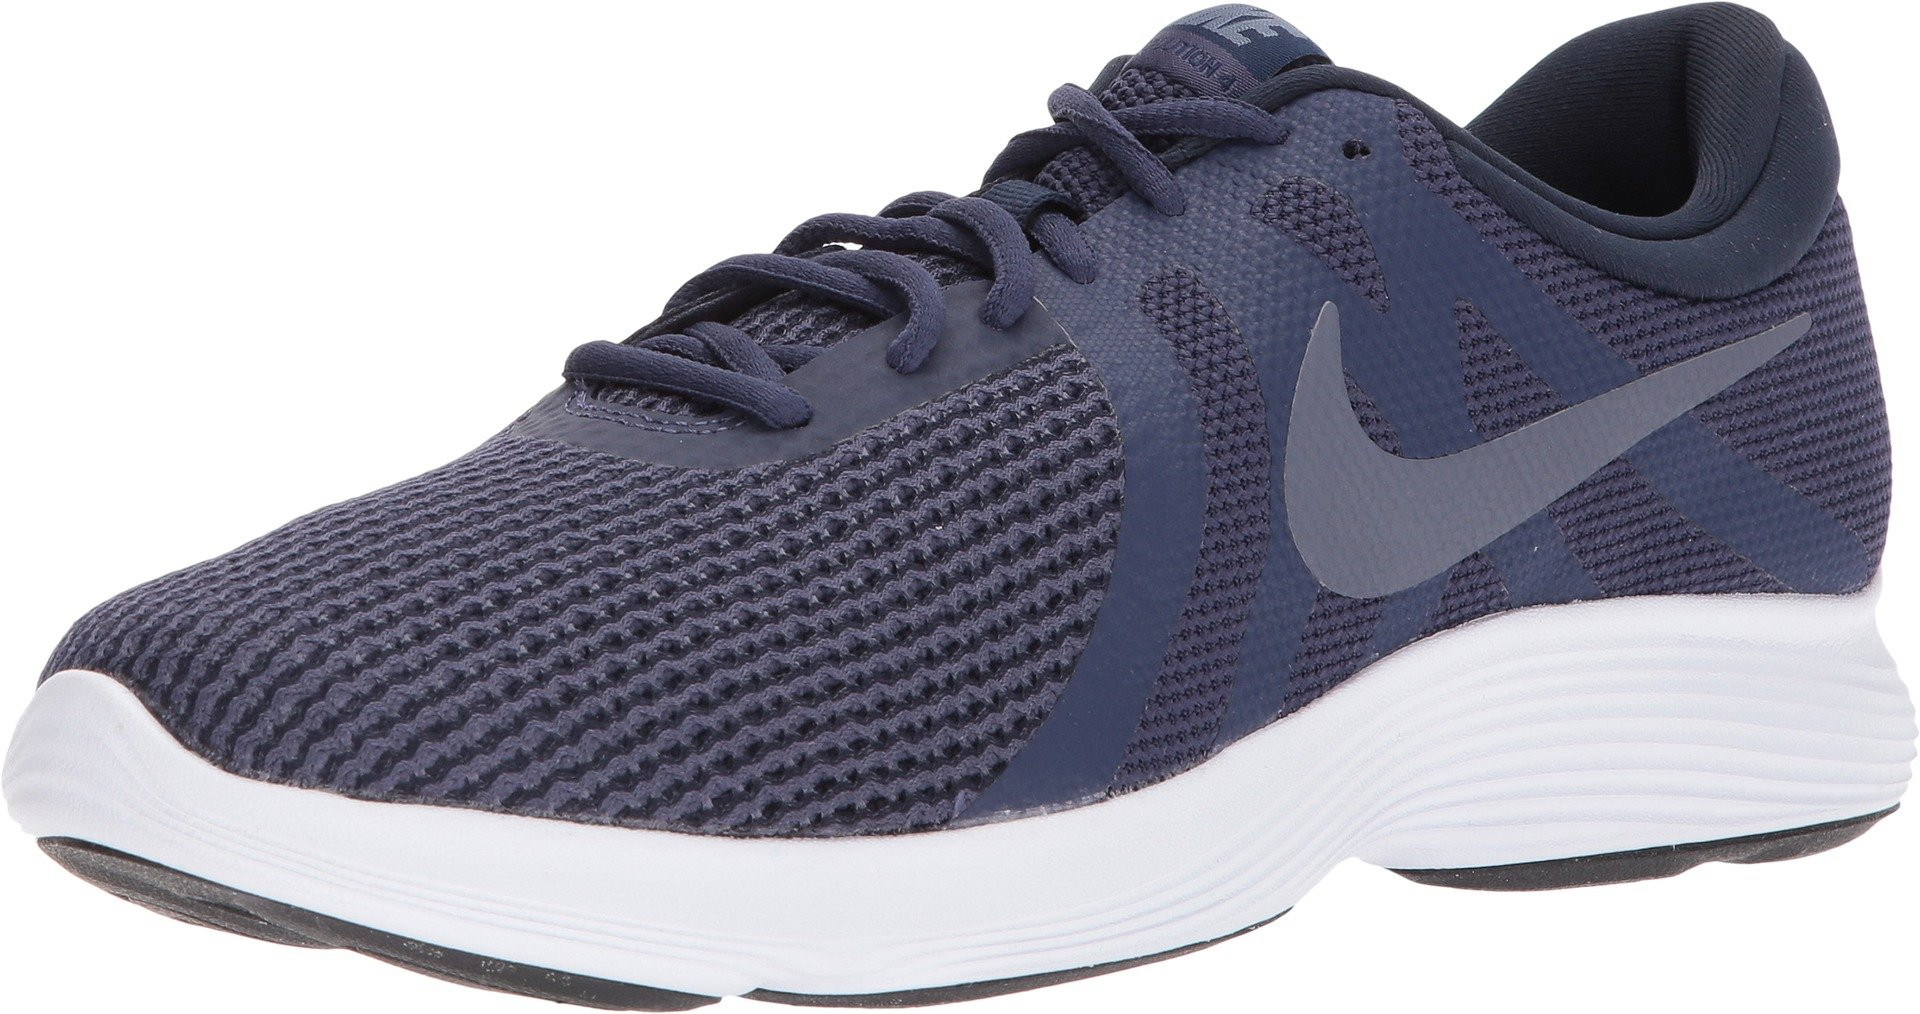 Nike Men's Revolution 4 Running Shoe (11.5 M US, NTRL Indigo Lt CRBN Obsidian)